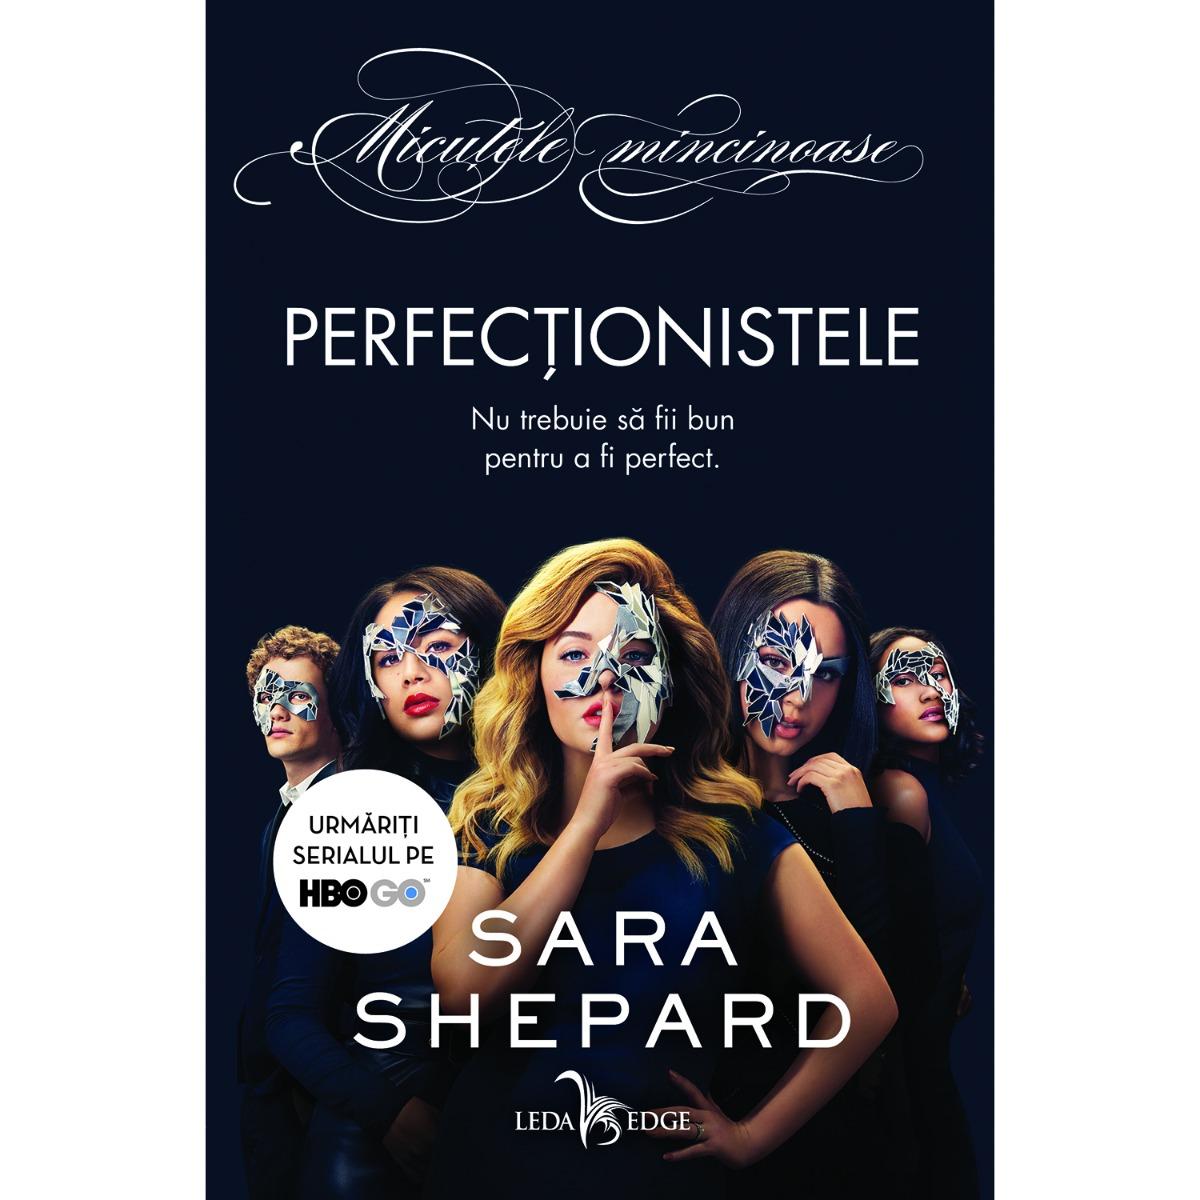 Carte Editura Corint, Perfectionistele, Sara Shepard imagine